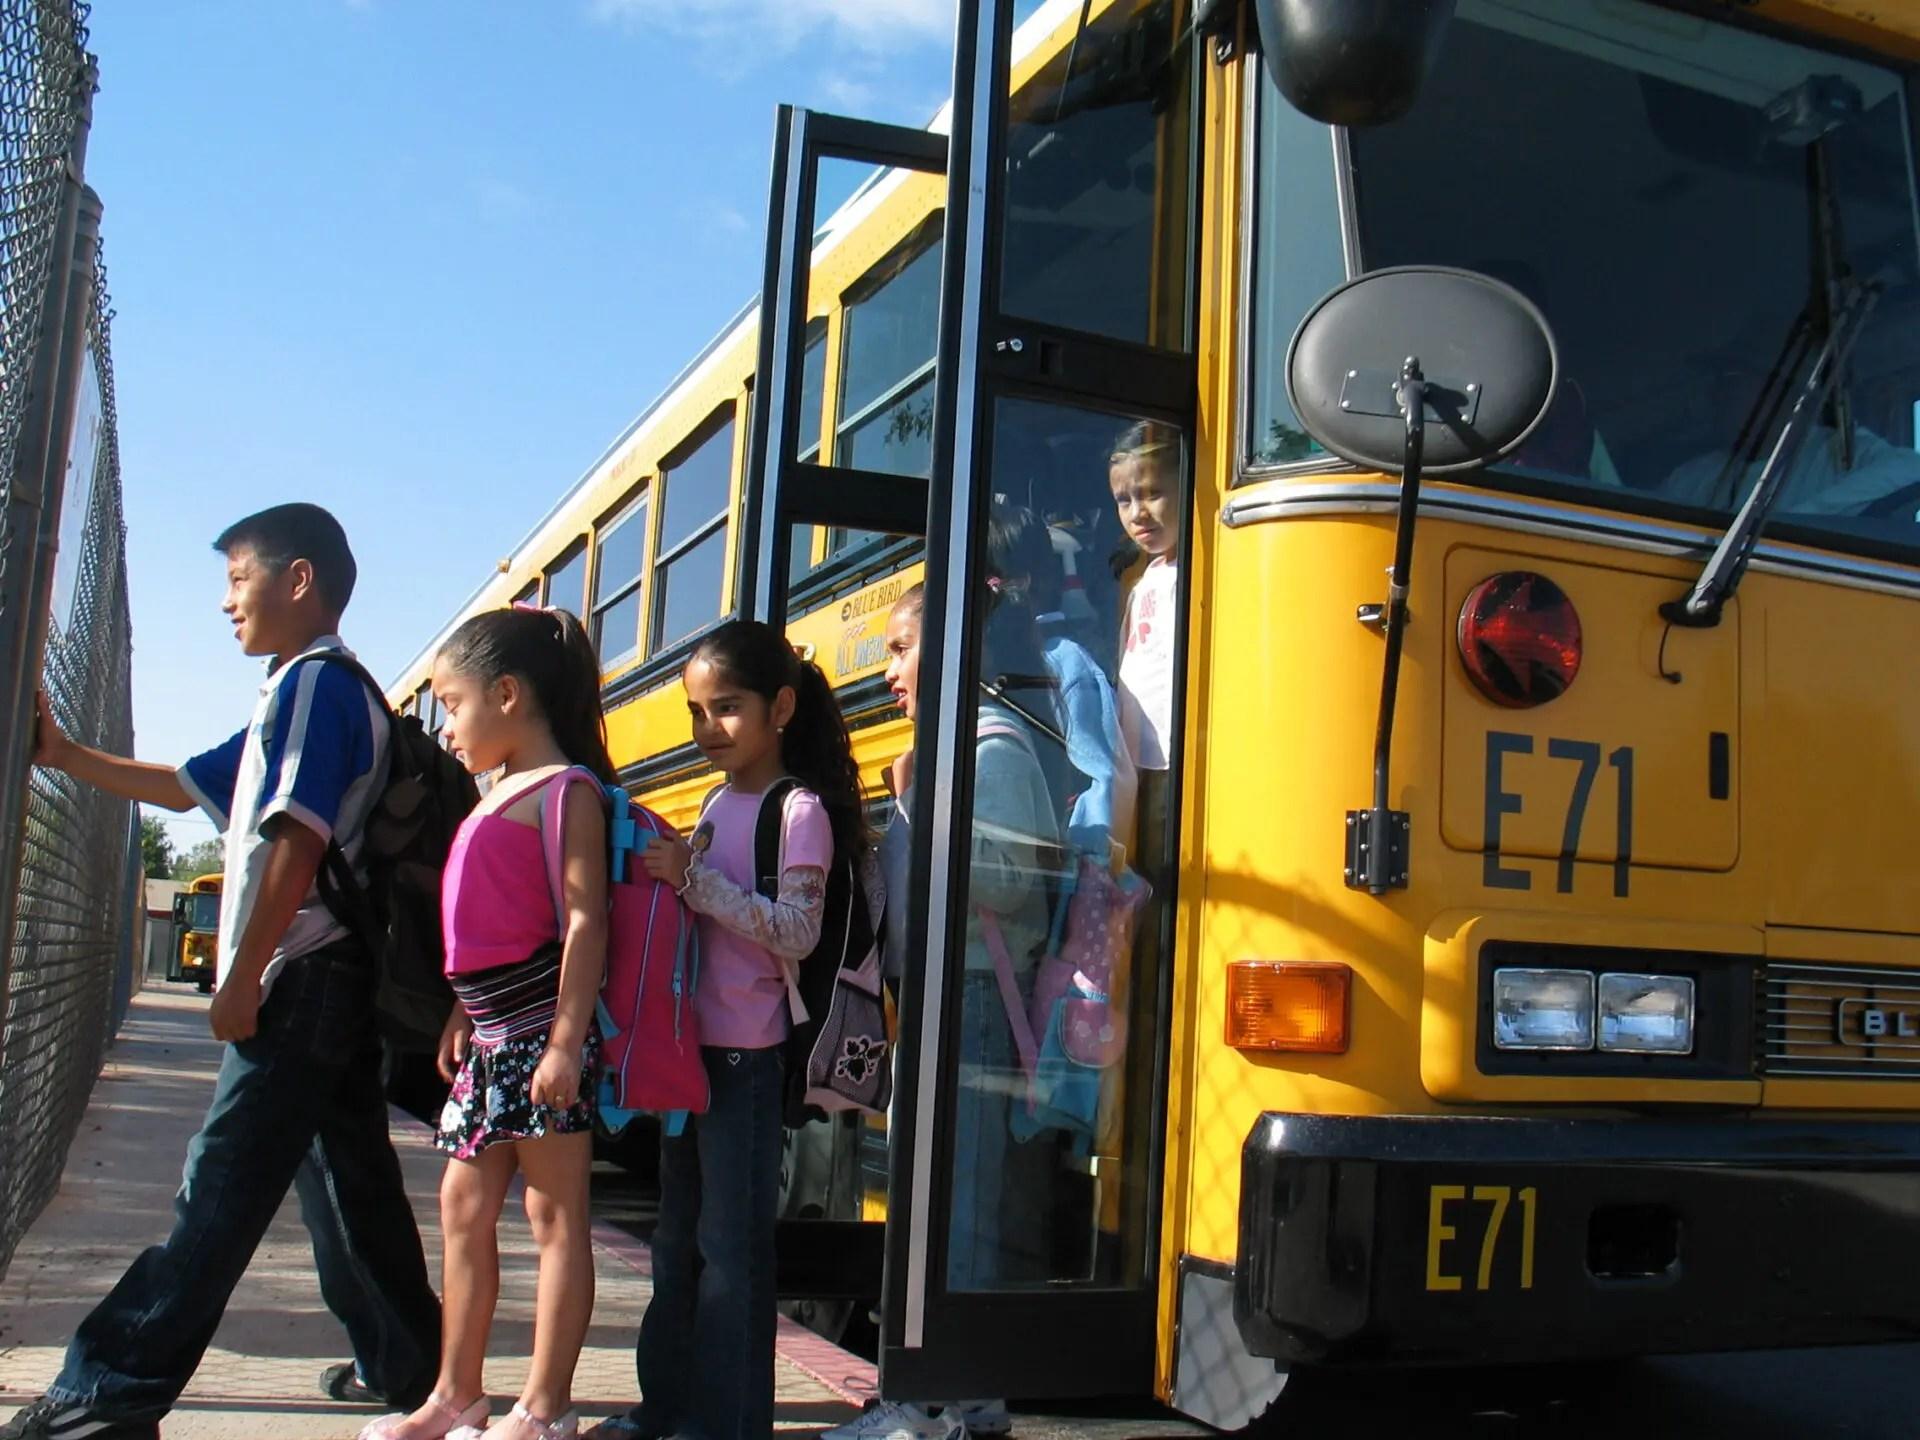 Tempe Elementary Kyrene Among Top Scorers For School Bus